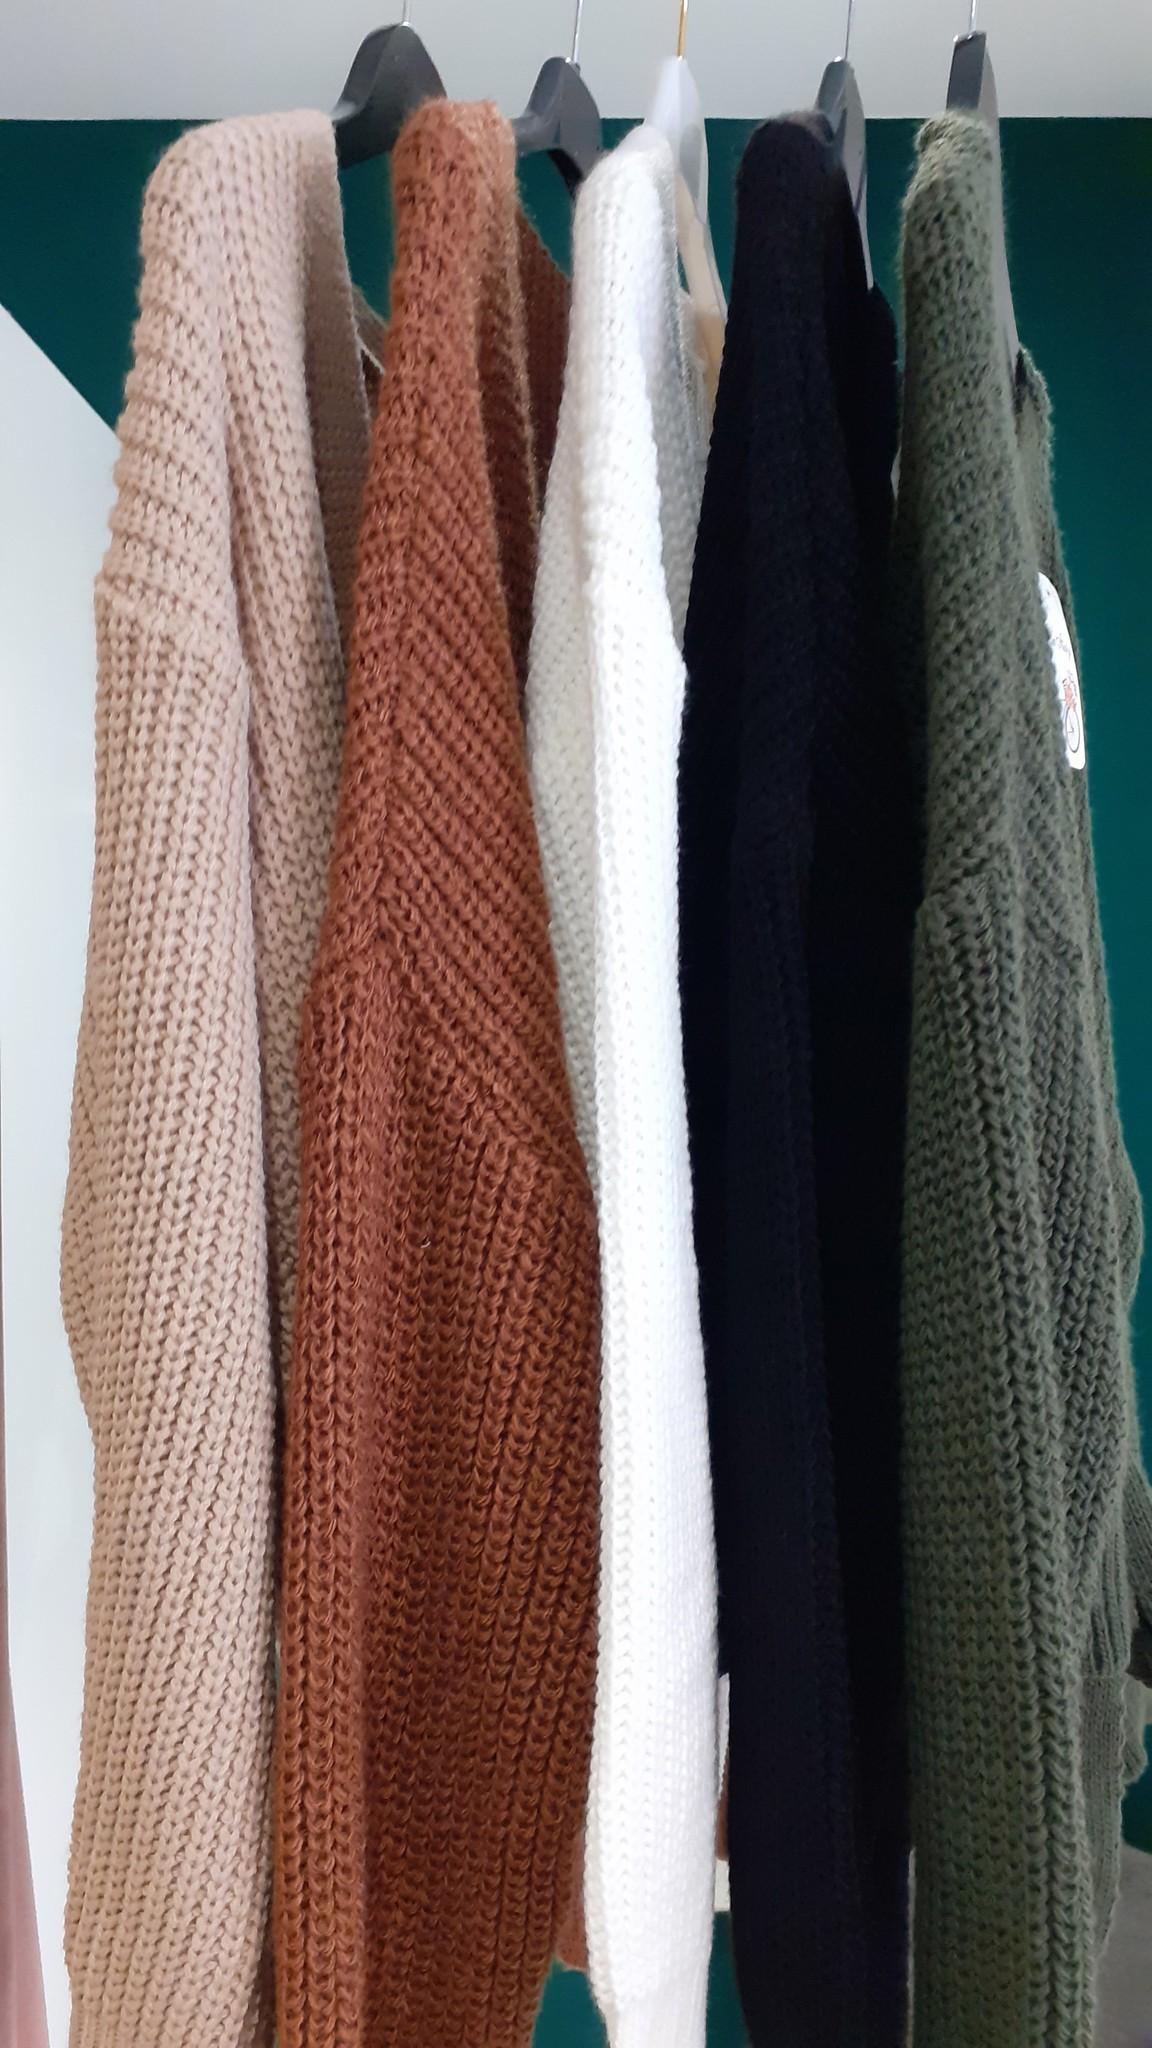 Knoopvestjes in 5 kleuren